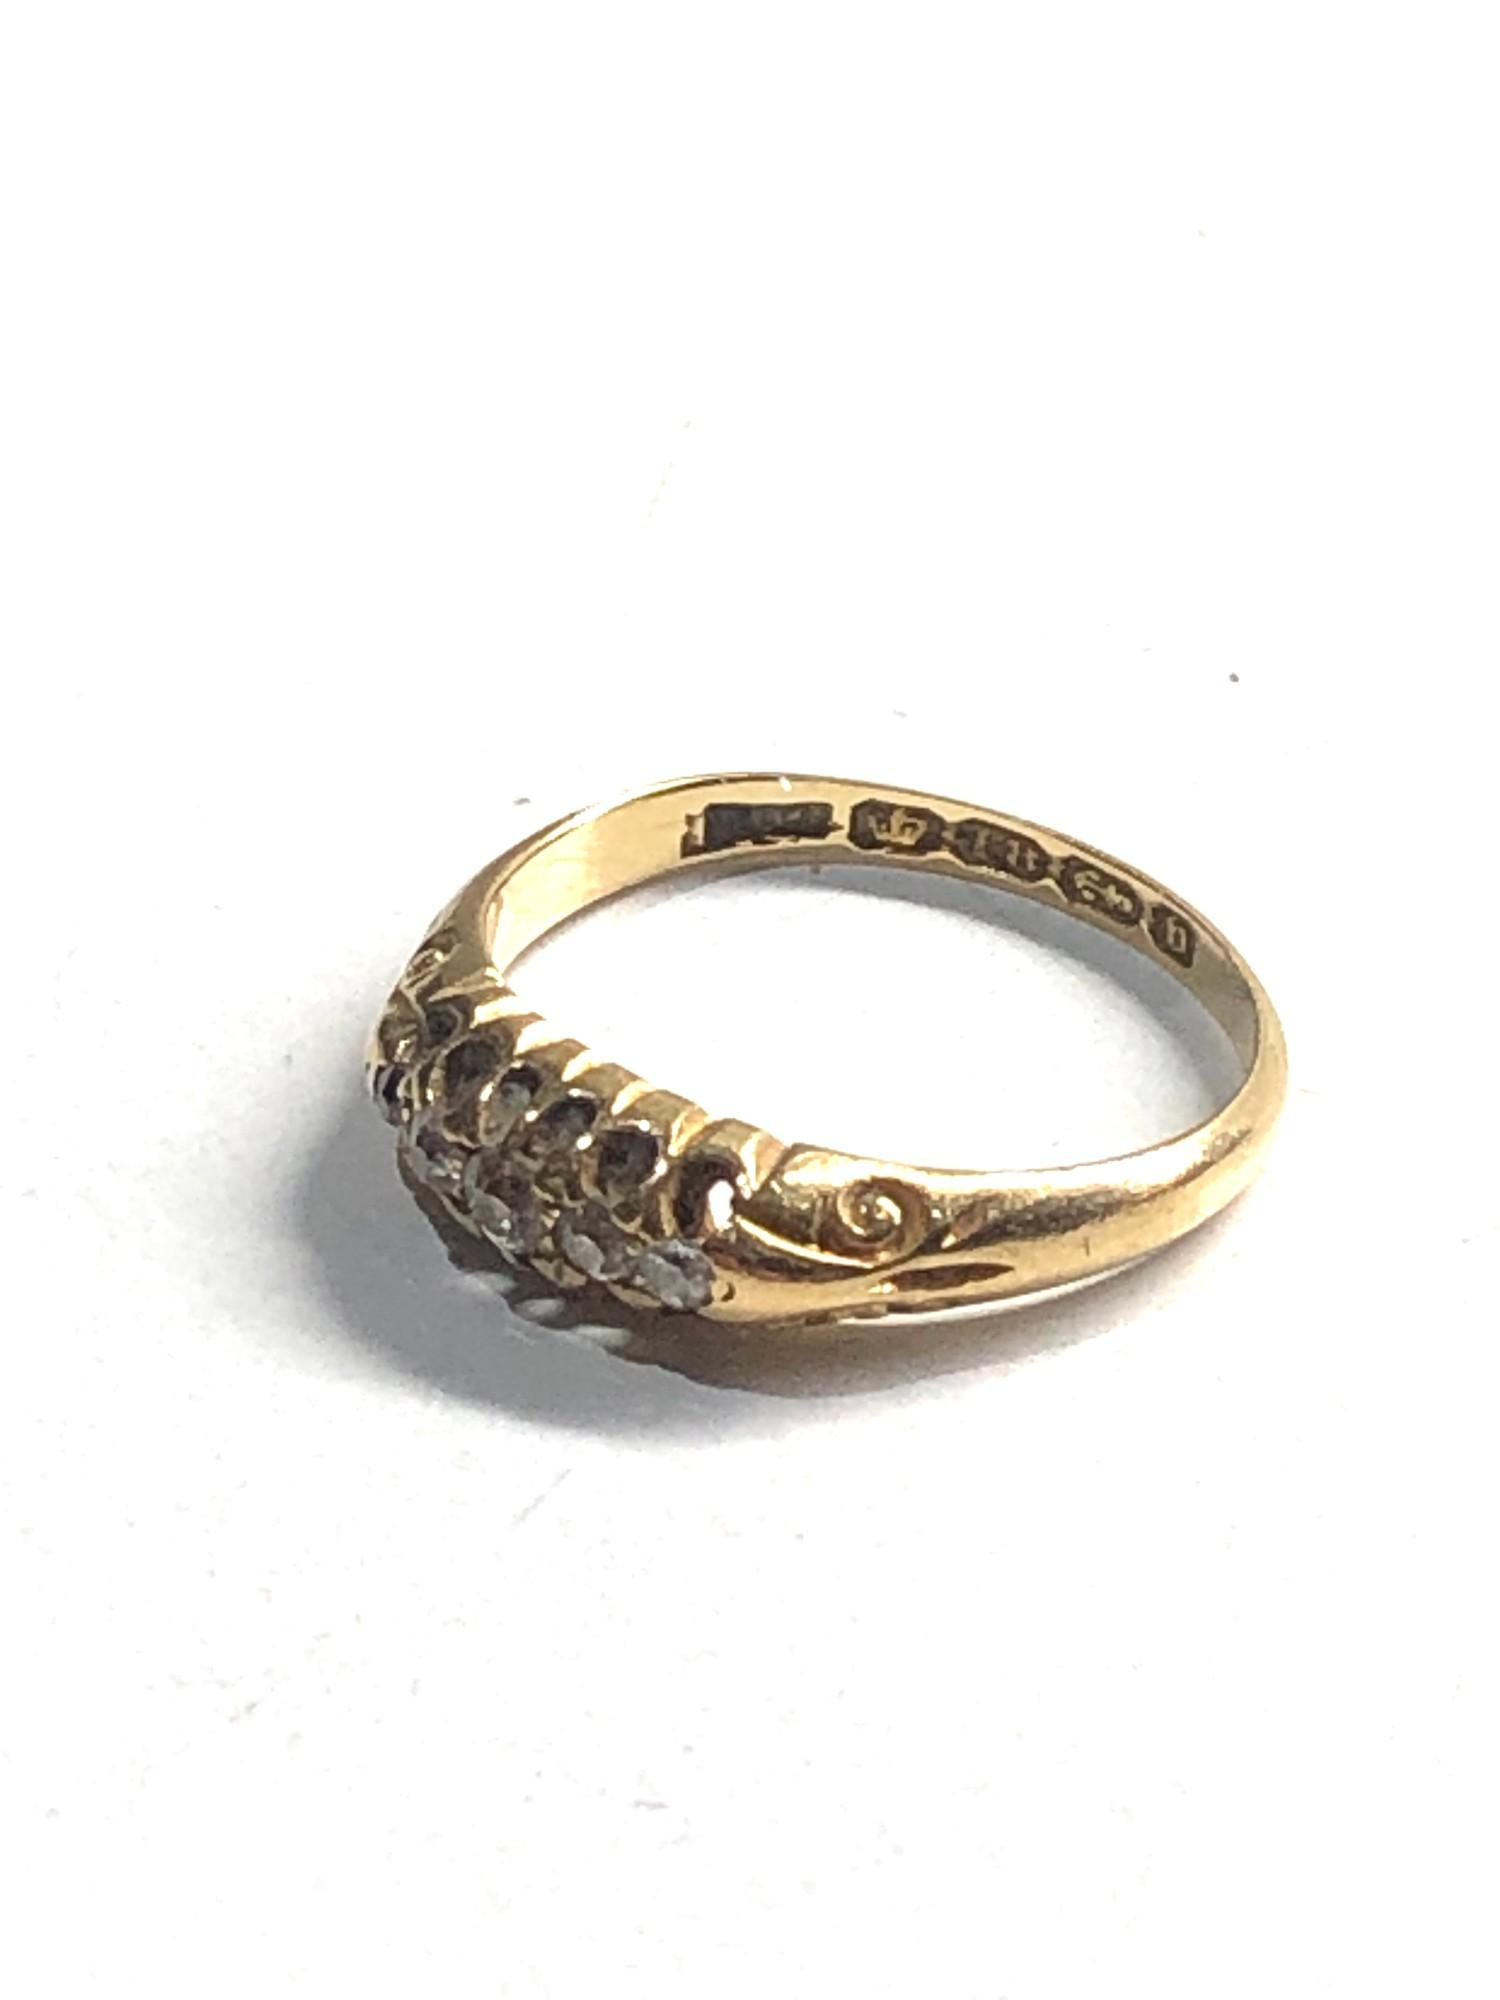 18ct vintage diamond five stone ring 2.4g - Image 2 of 3